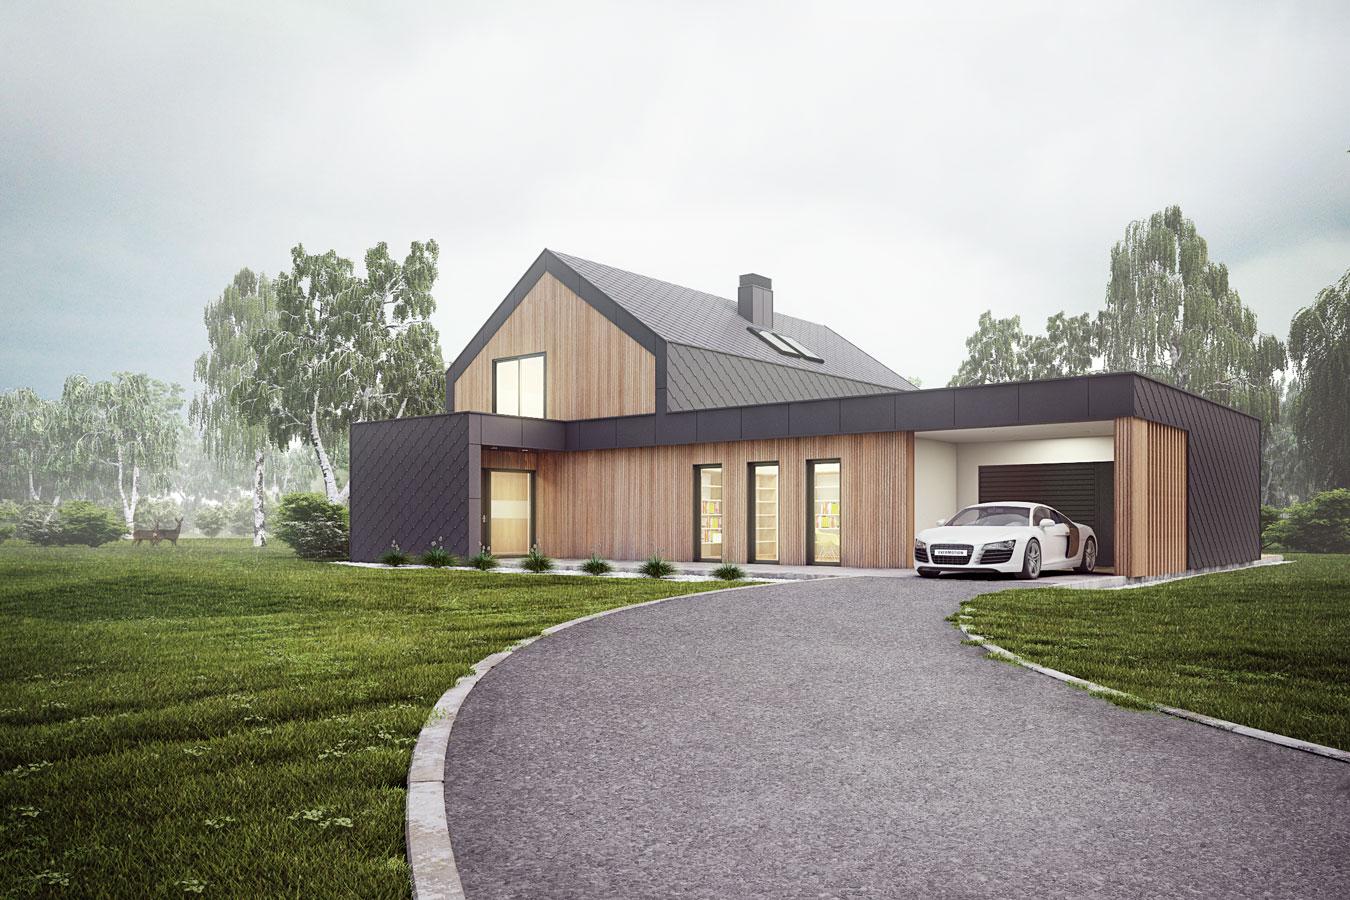 projektiranje hiše arhitekt Kranj PGD